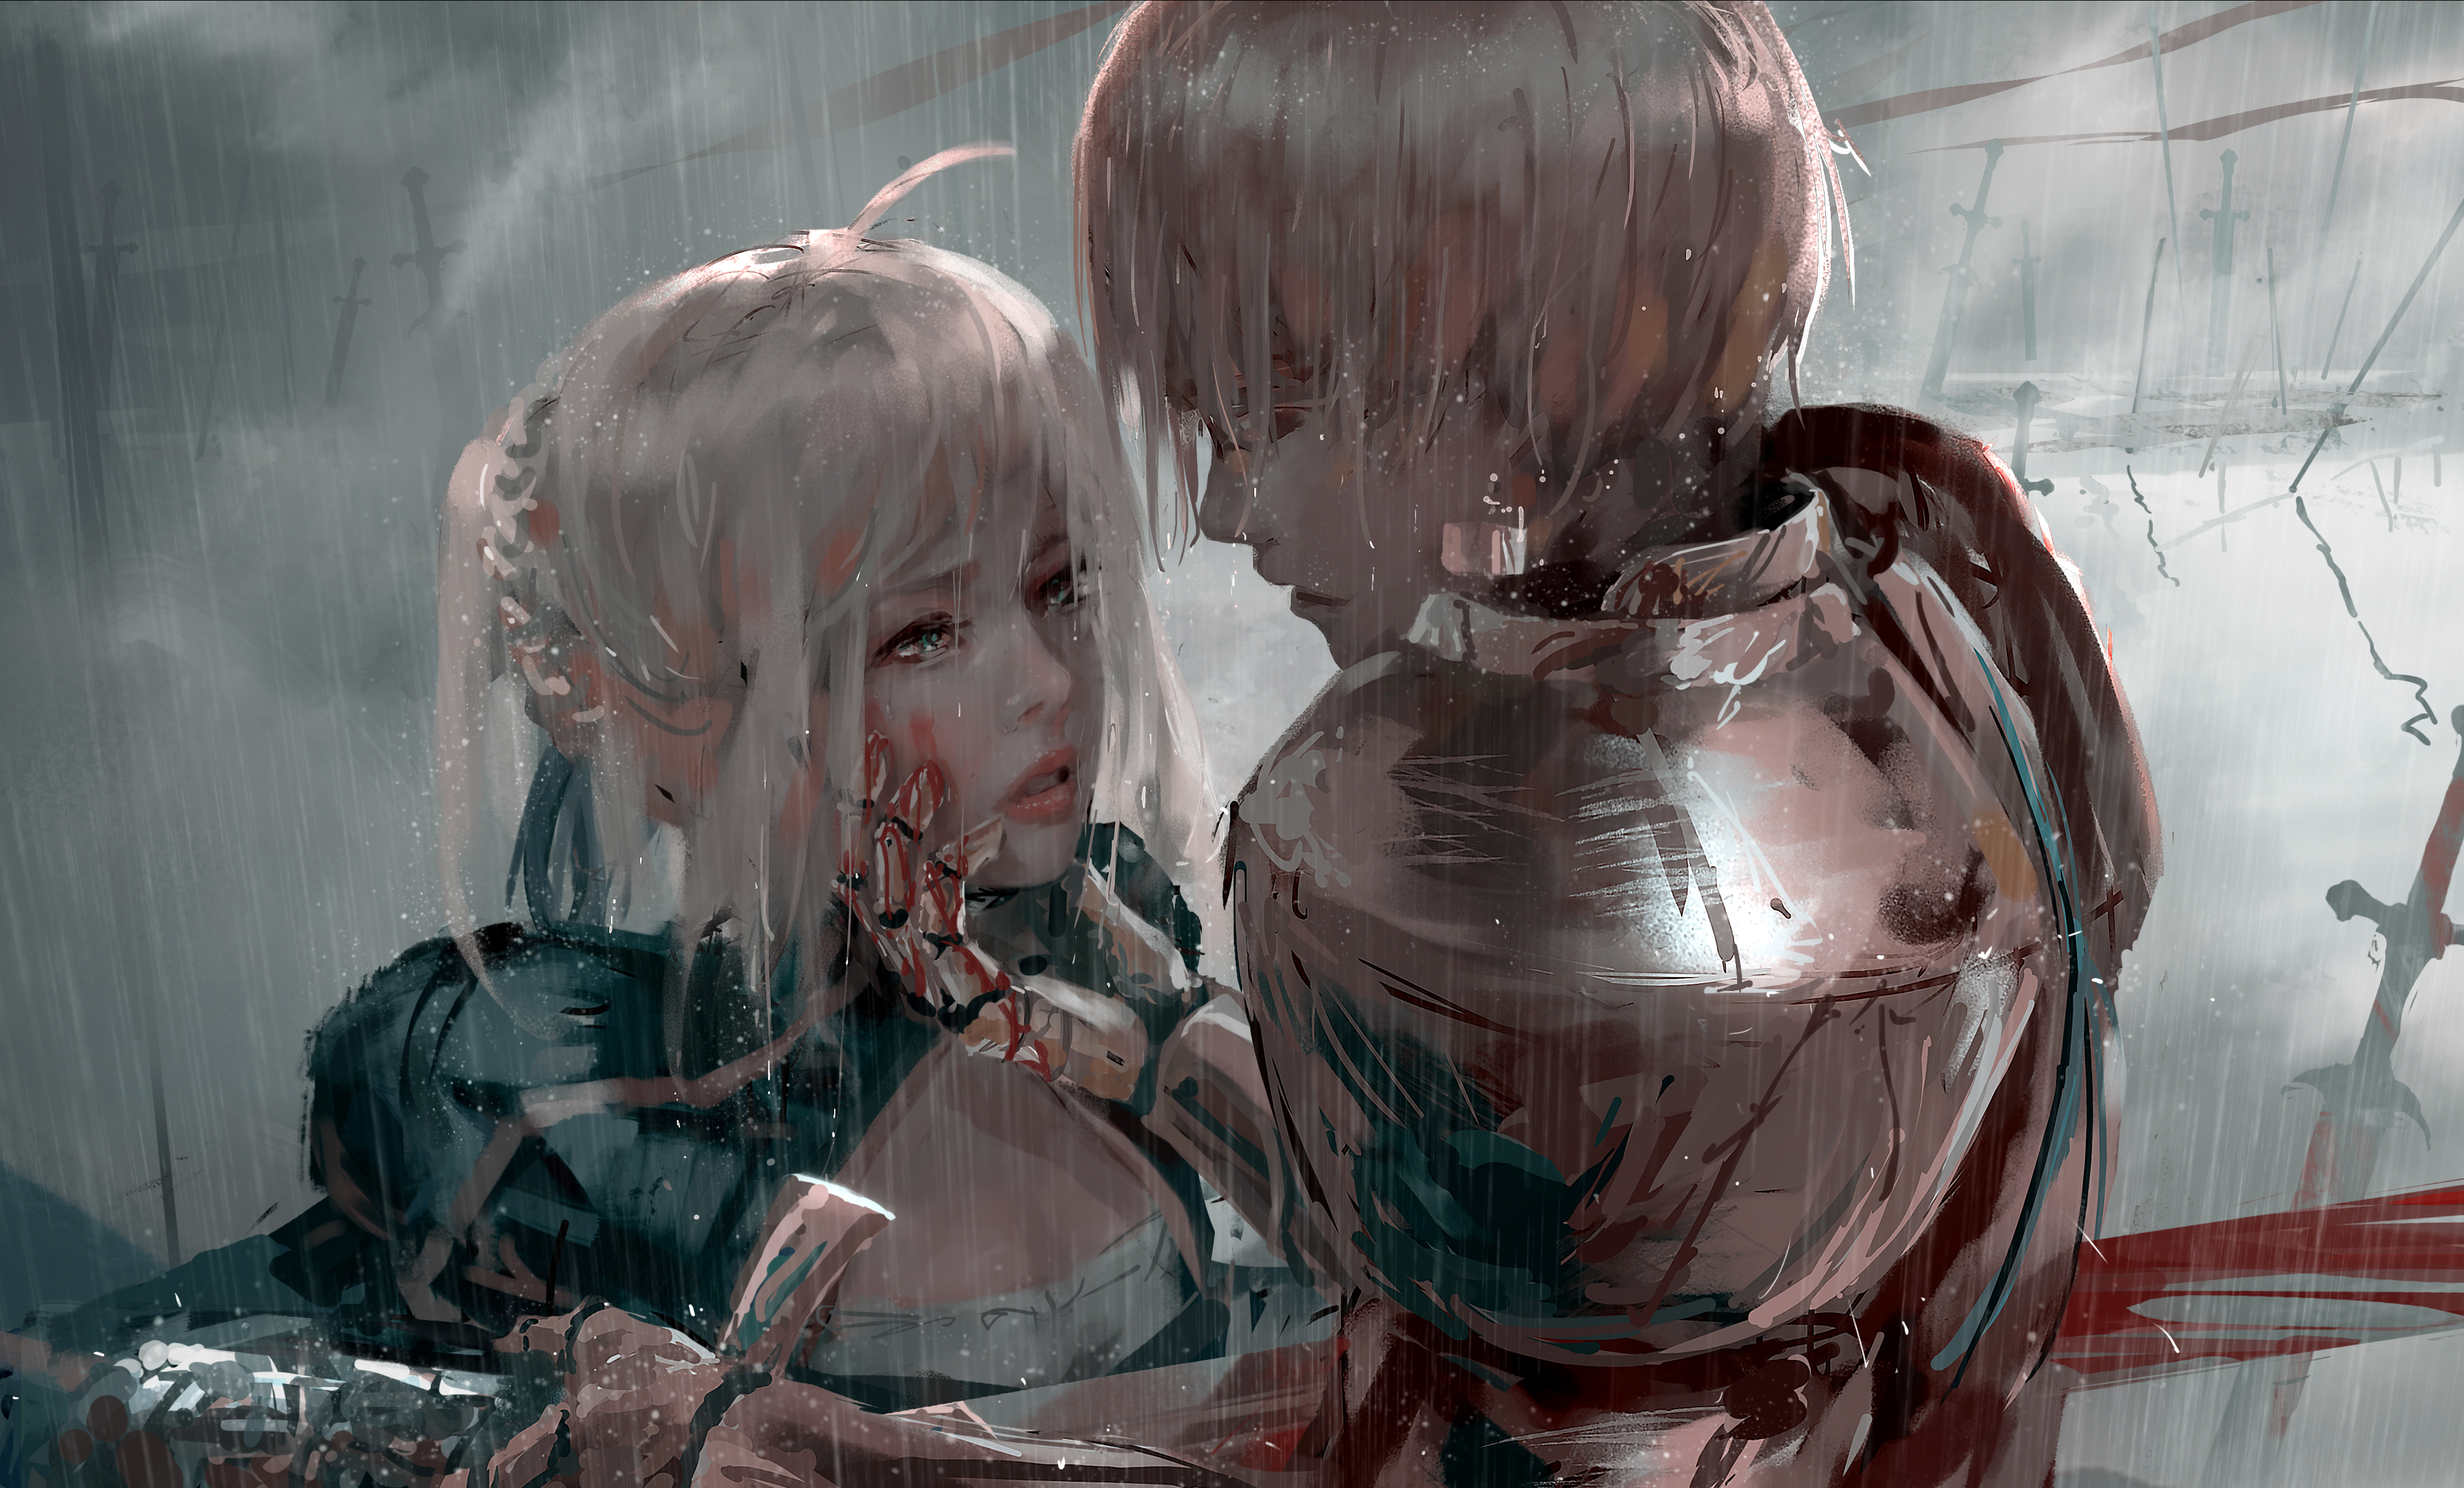 Anime 4000x2416 digital art artwork women blonde short hair anime anime girls armour WLOP blood sword Fate/Zero Saber Gilgamesh blue eyes Fate Series Fate/Stay Night